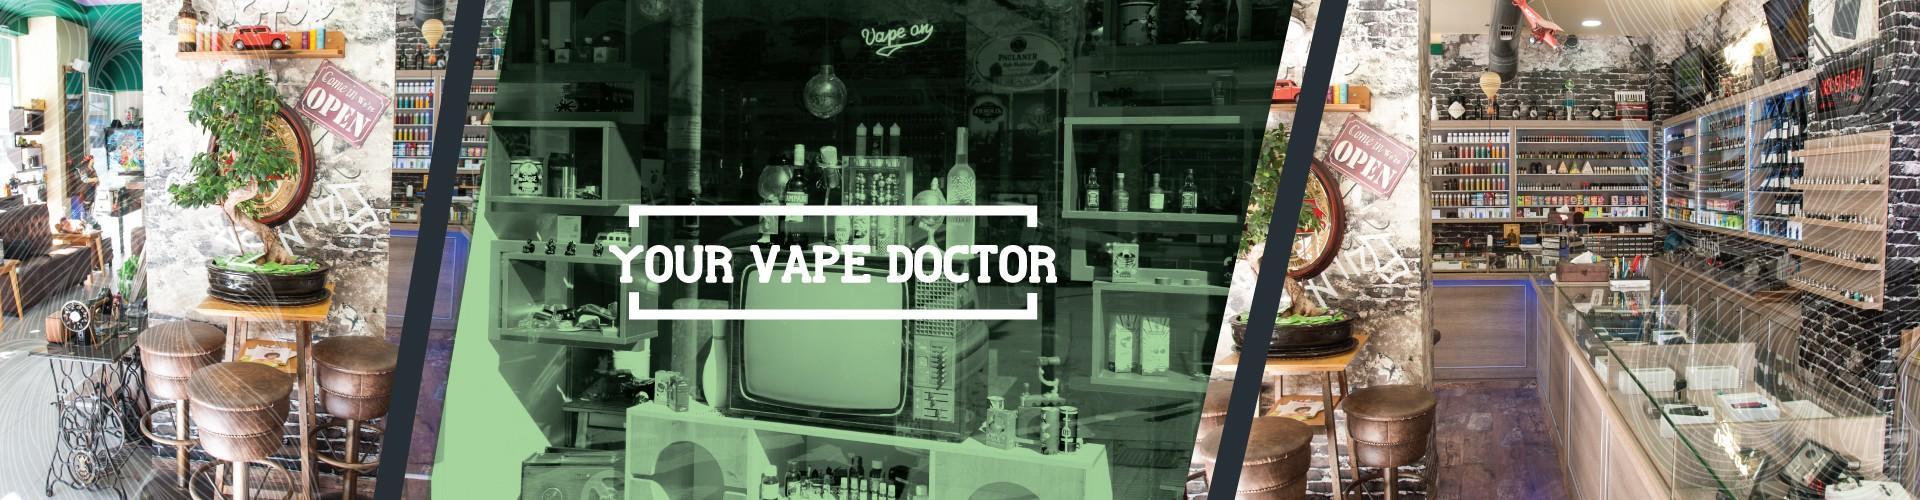 Doctor Antismoke | Your Vape Doctor